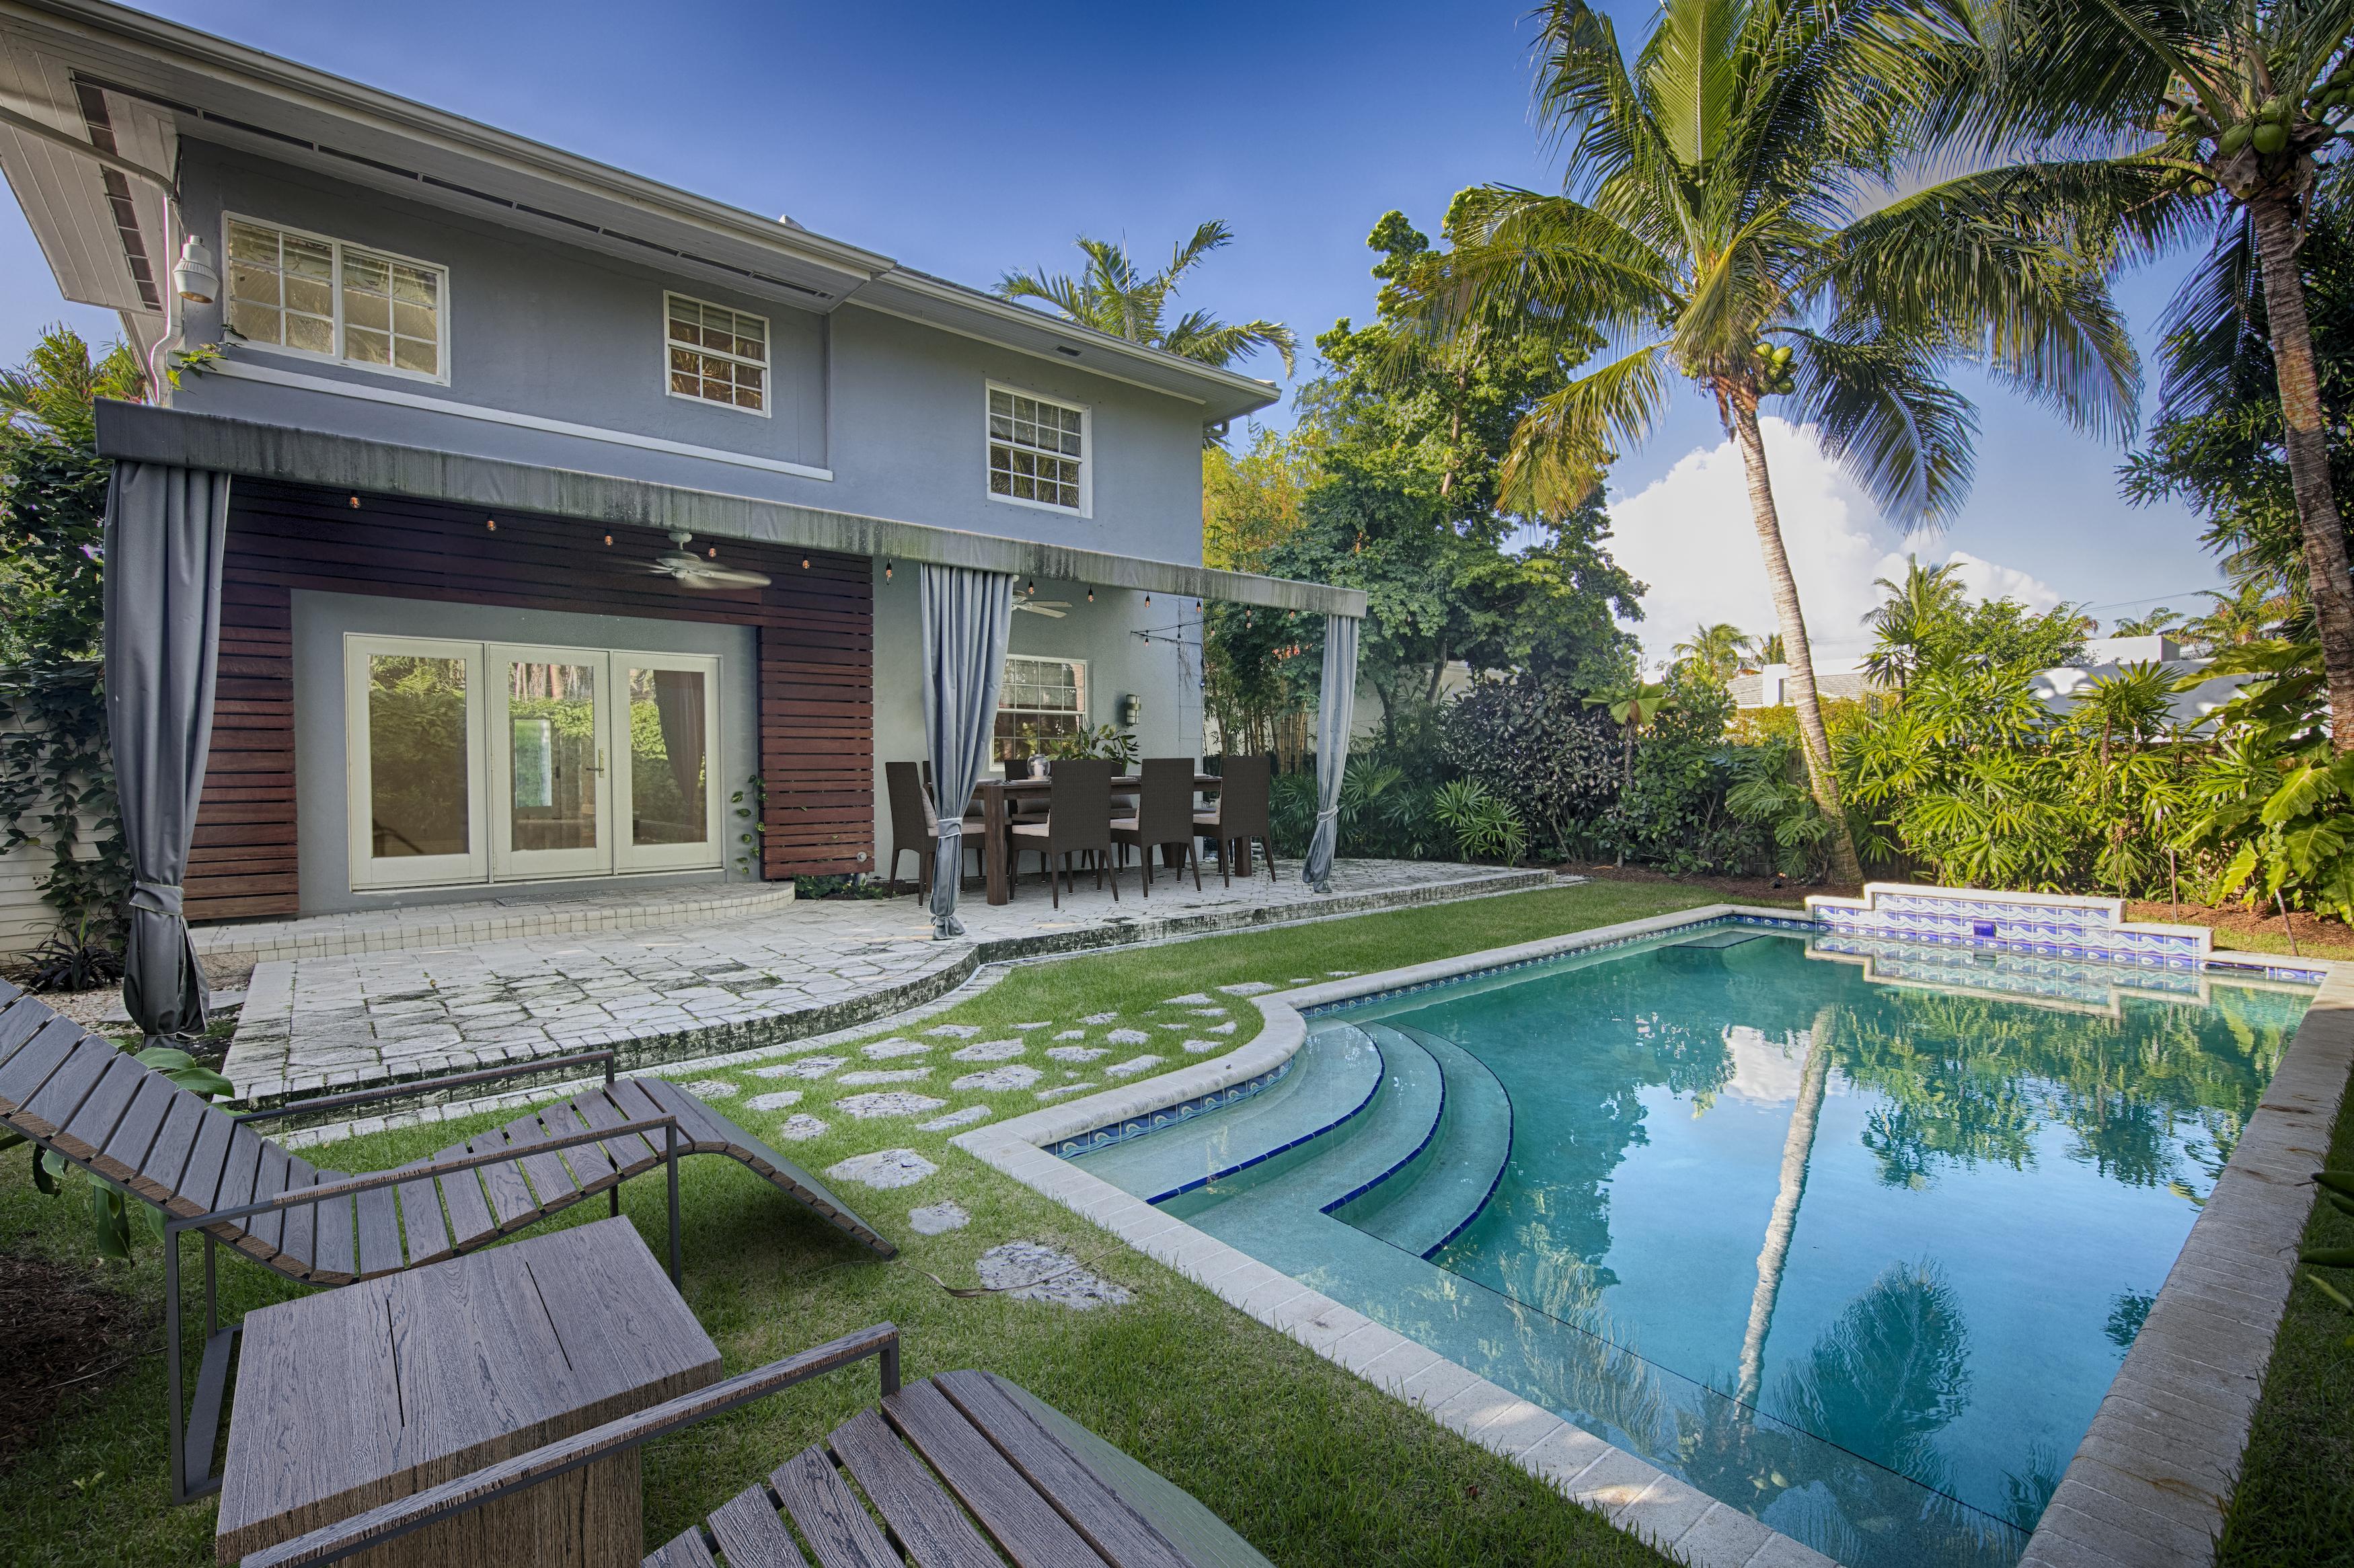 435 W 51 St miami beach elysium home